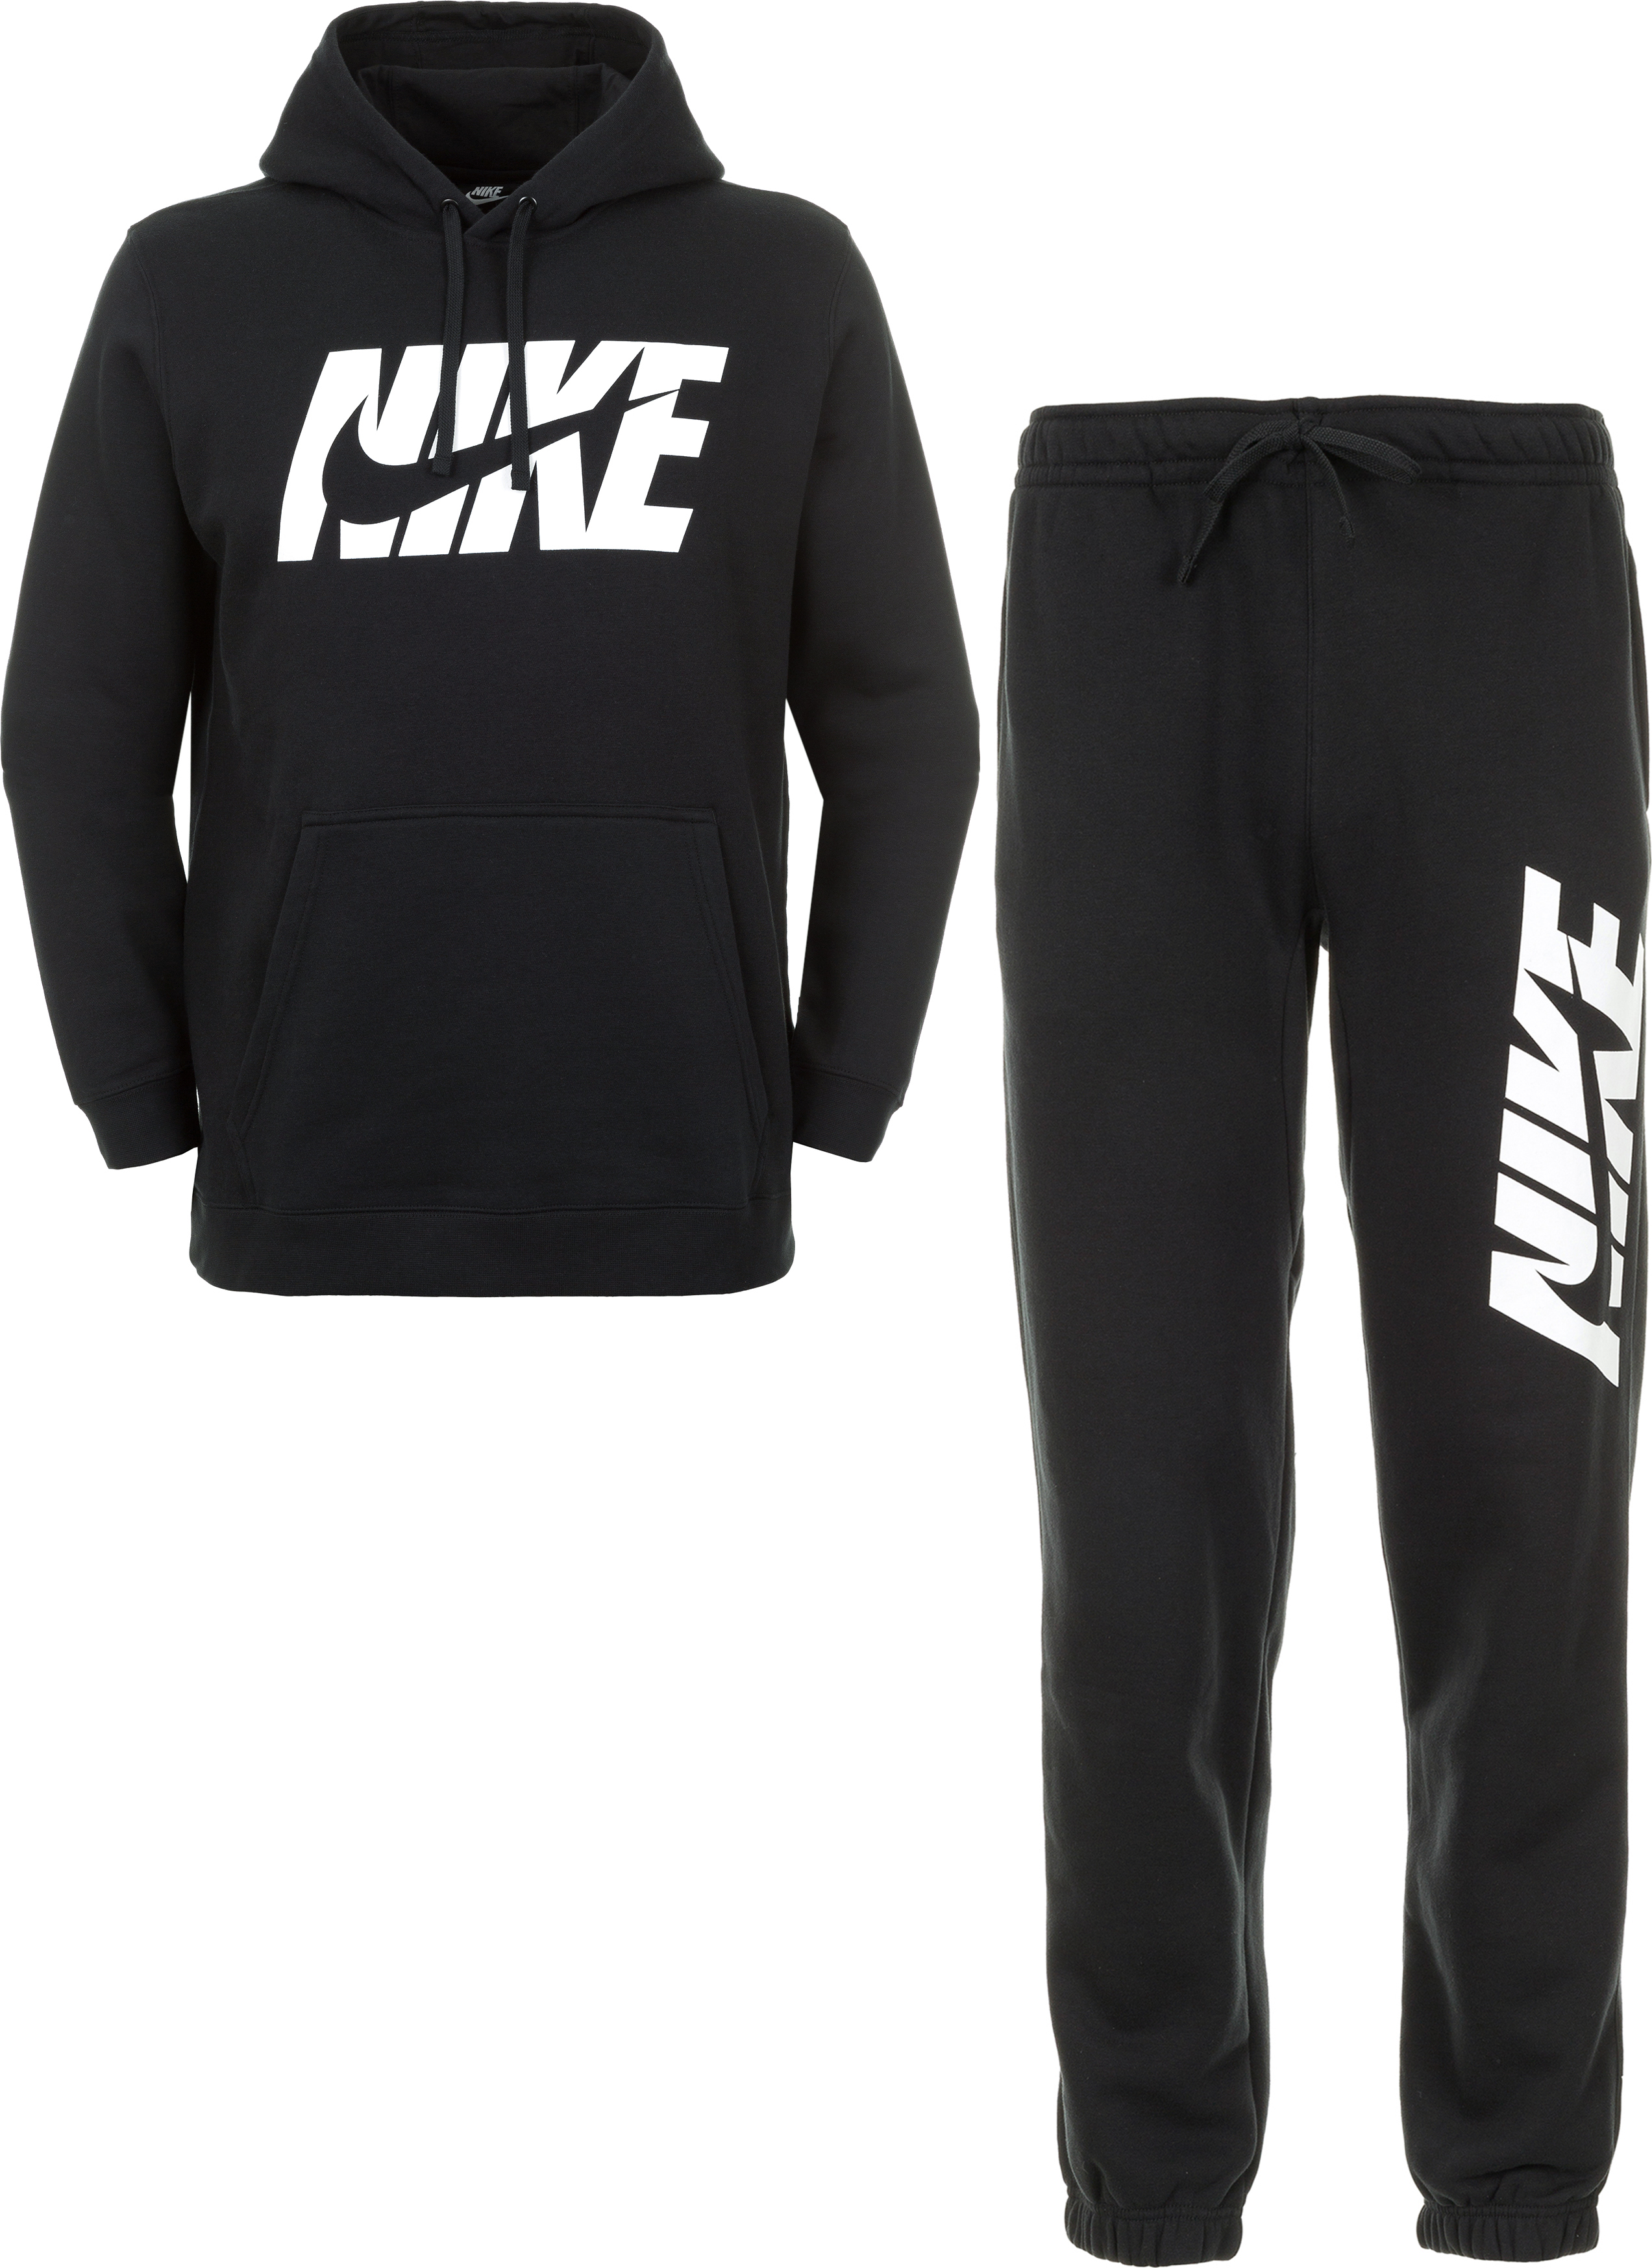 Nike Костюм спортивный мужской Nike Sportswear, размер 54-56 костюм зомби скелетона 56